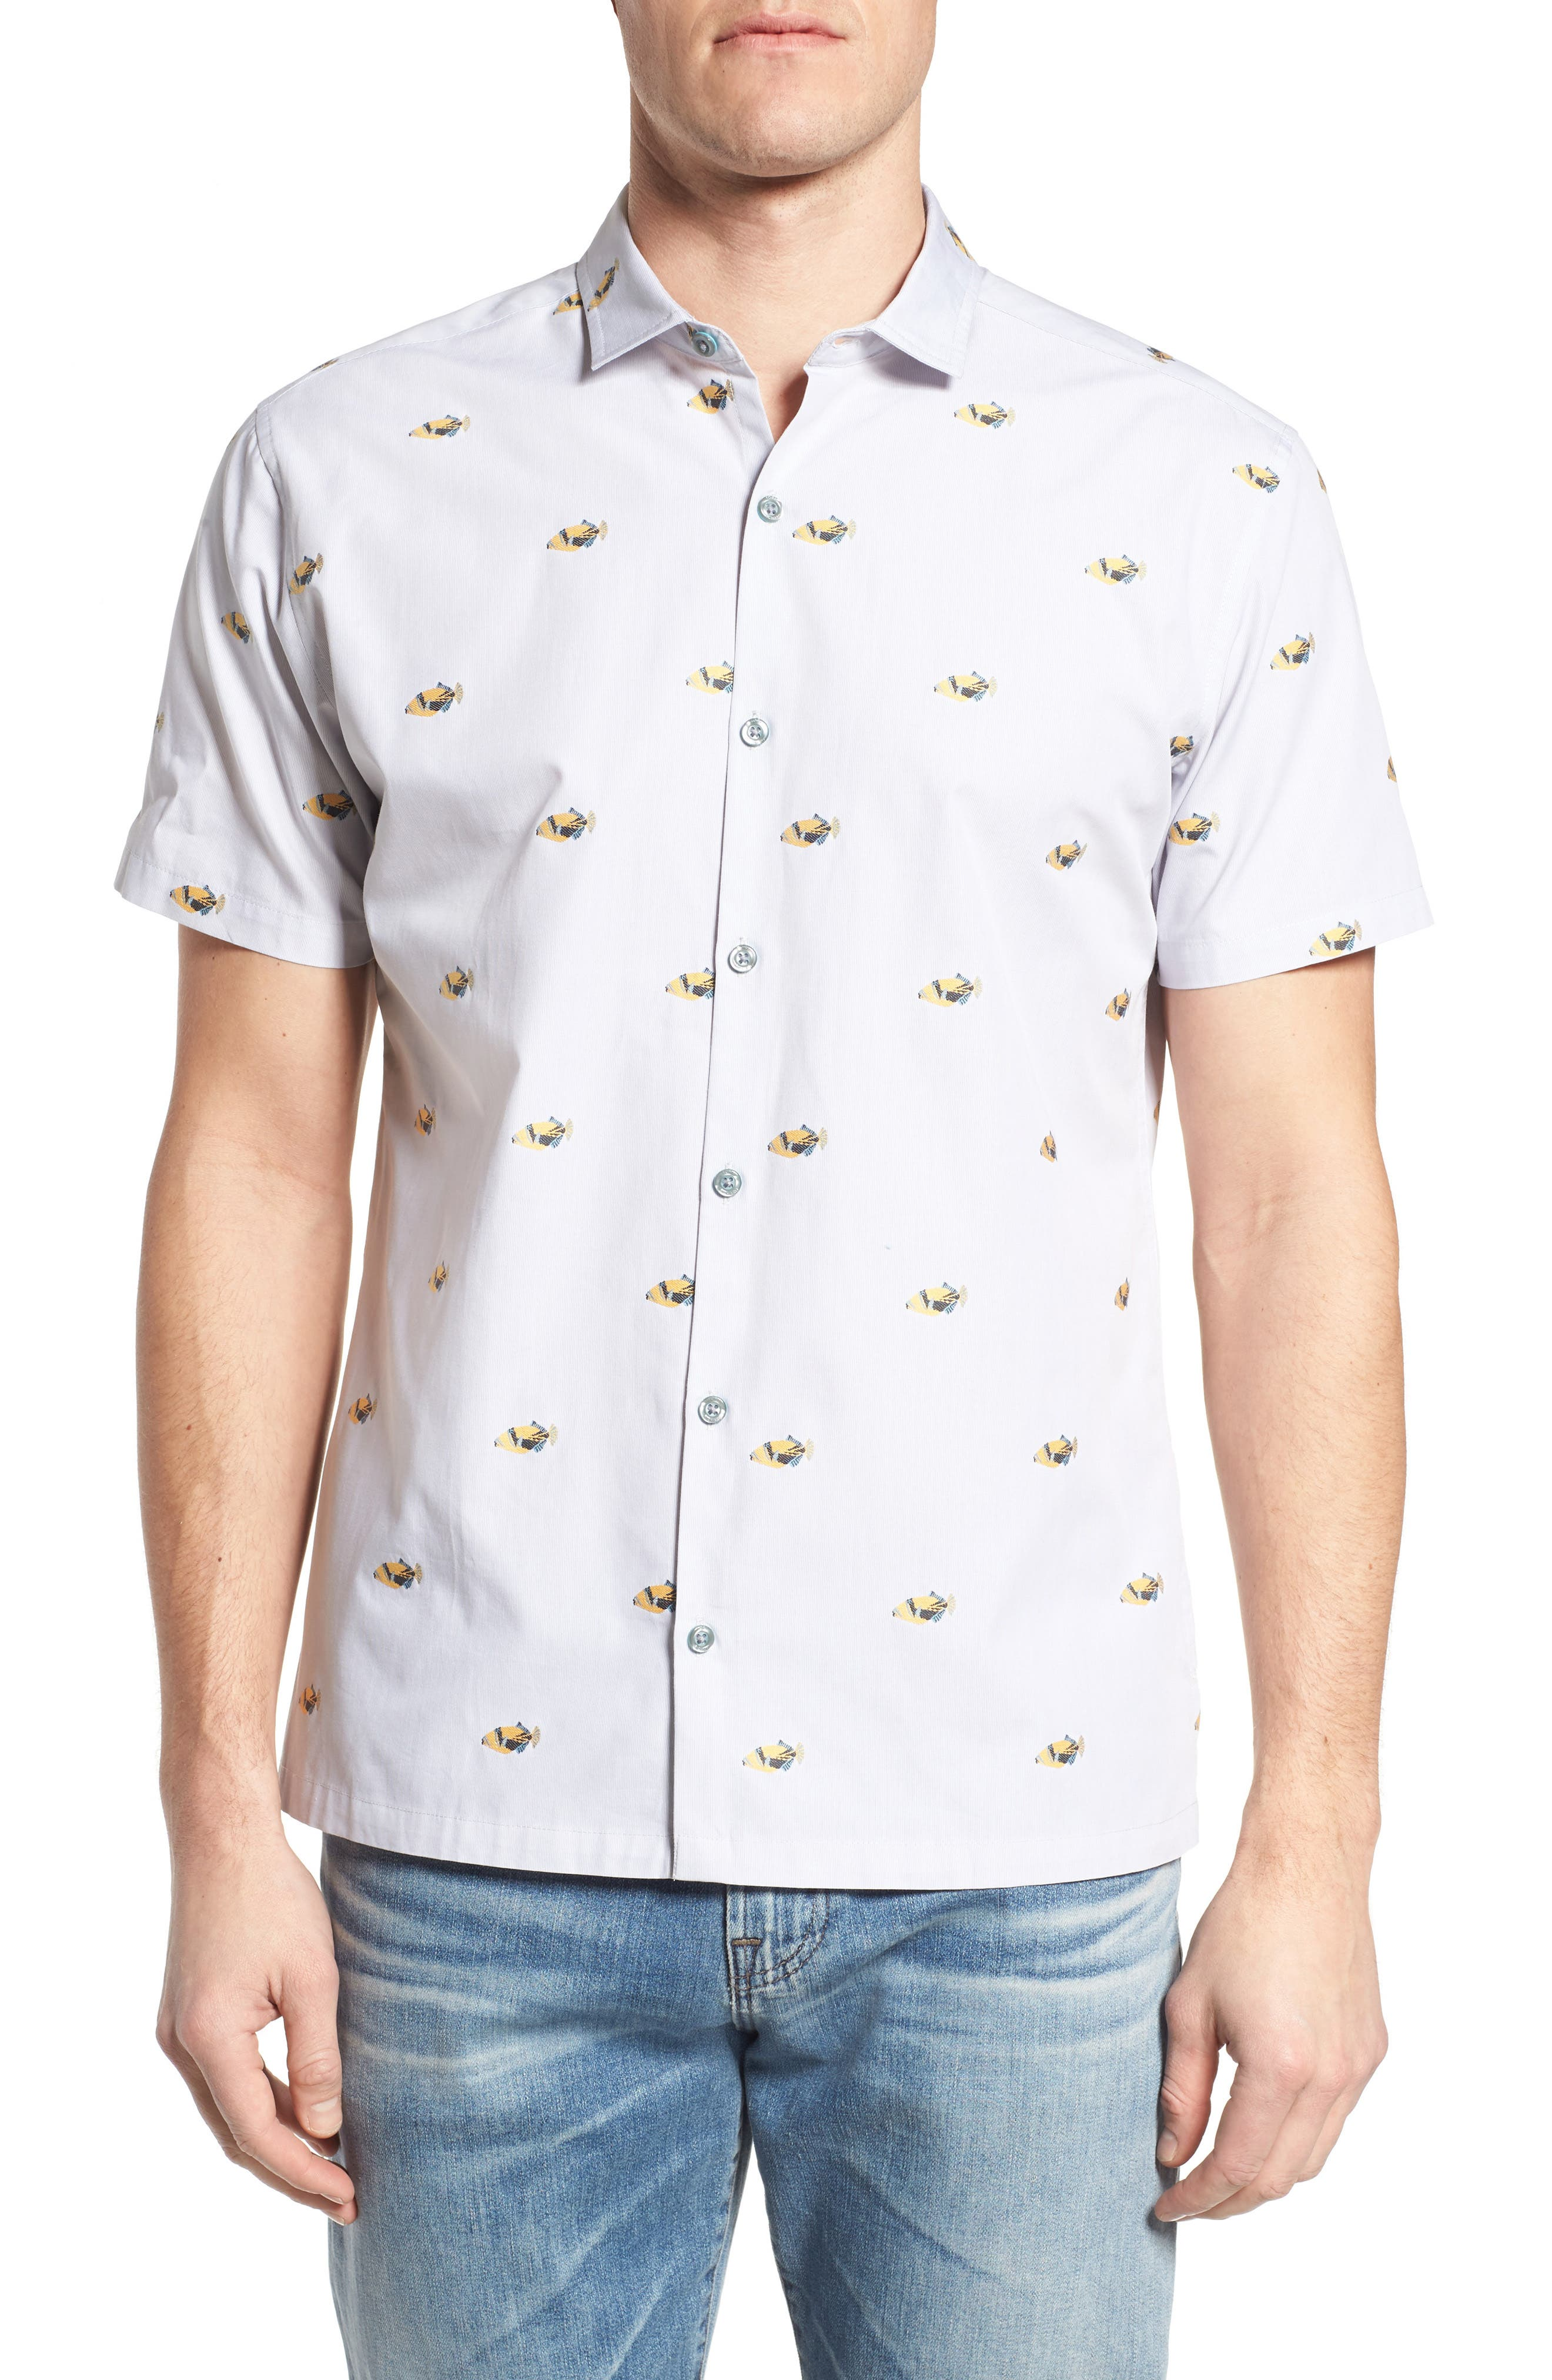 1Humu 2Humu Embroidered Sport Shirt,                         Main,                         color,